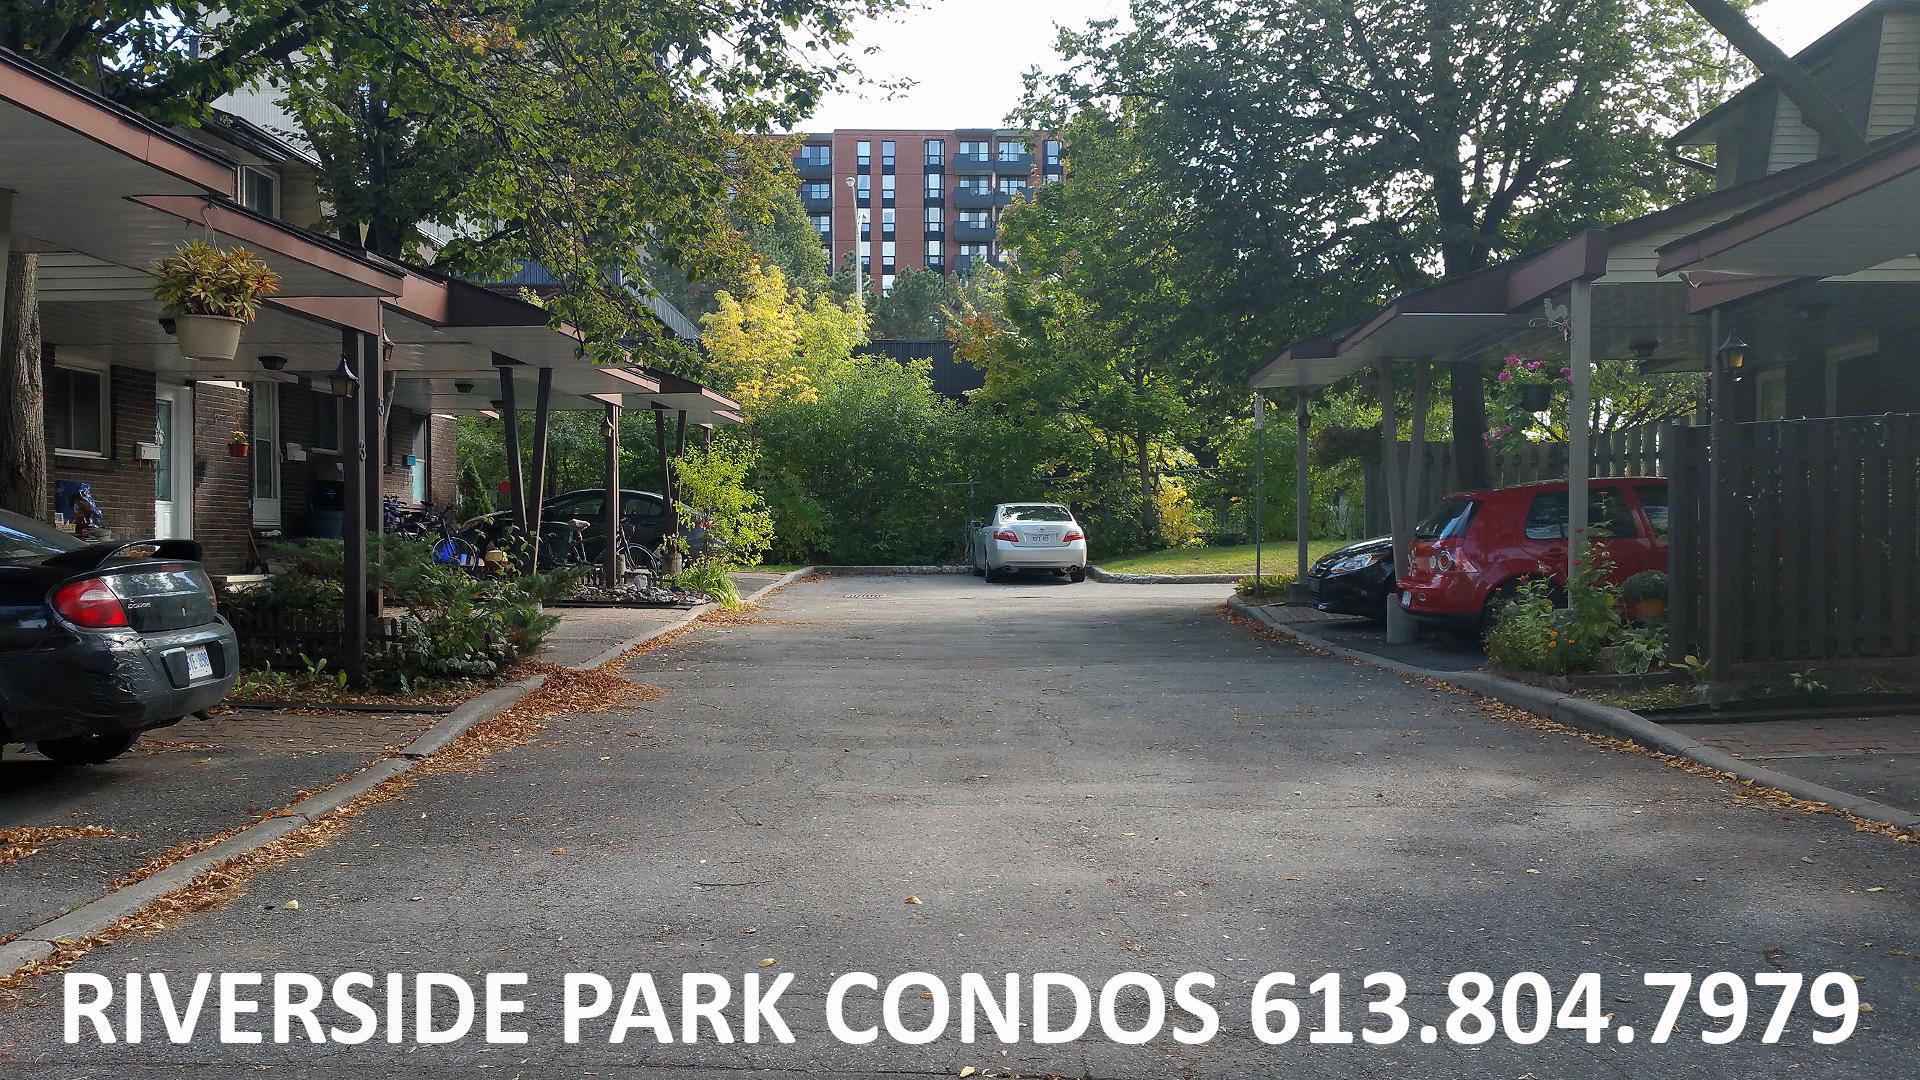 Ottawa condos for sale riverside park mooneys bay 2909 for Riverside park bathrooms